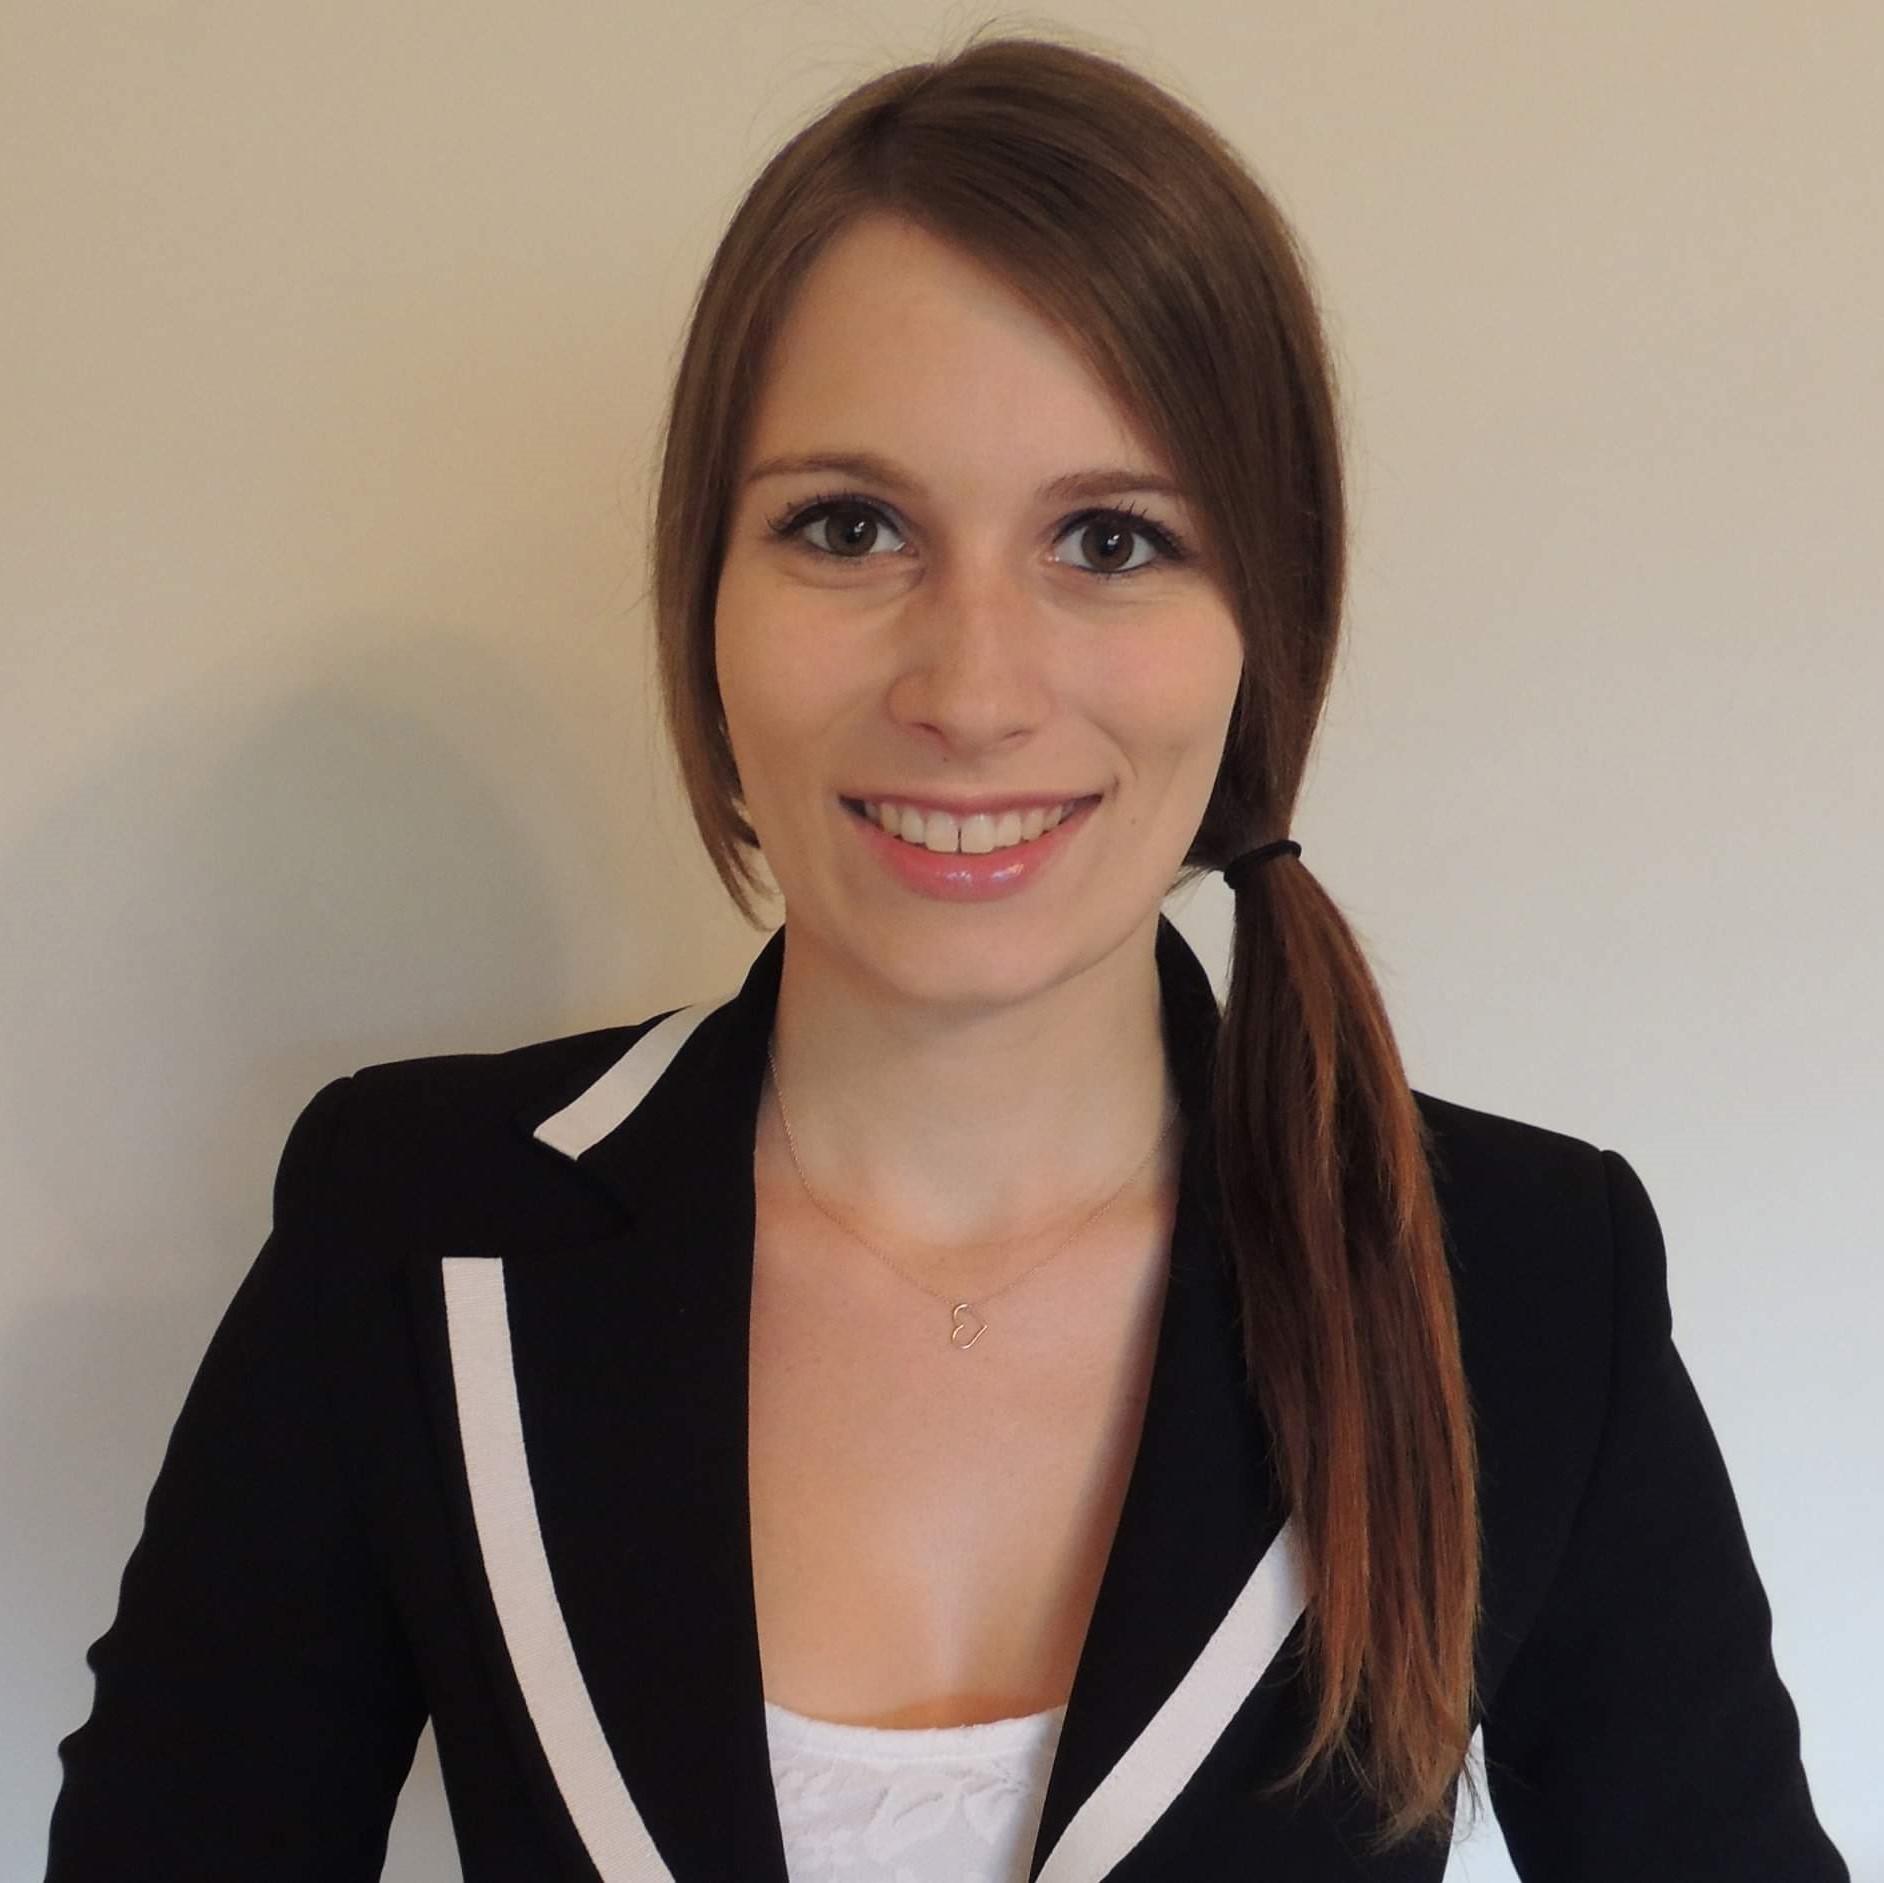 Katharina Feigl